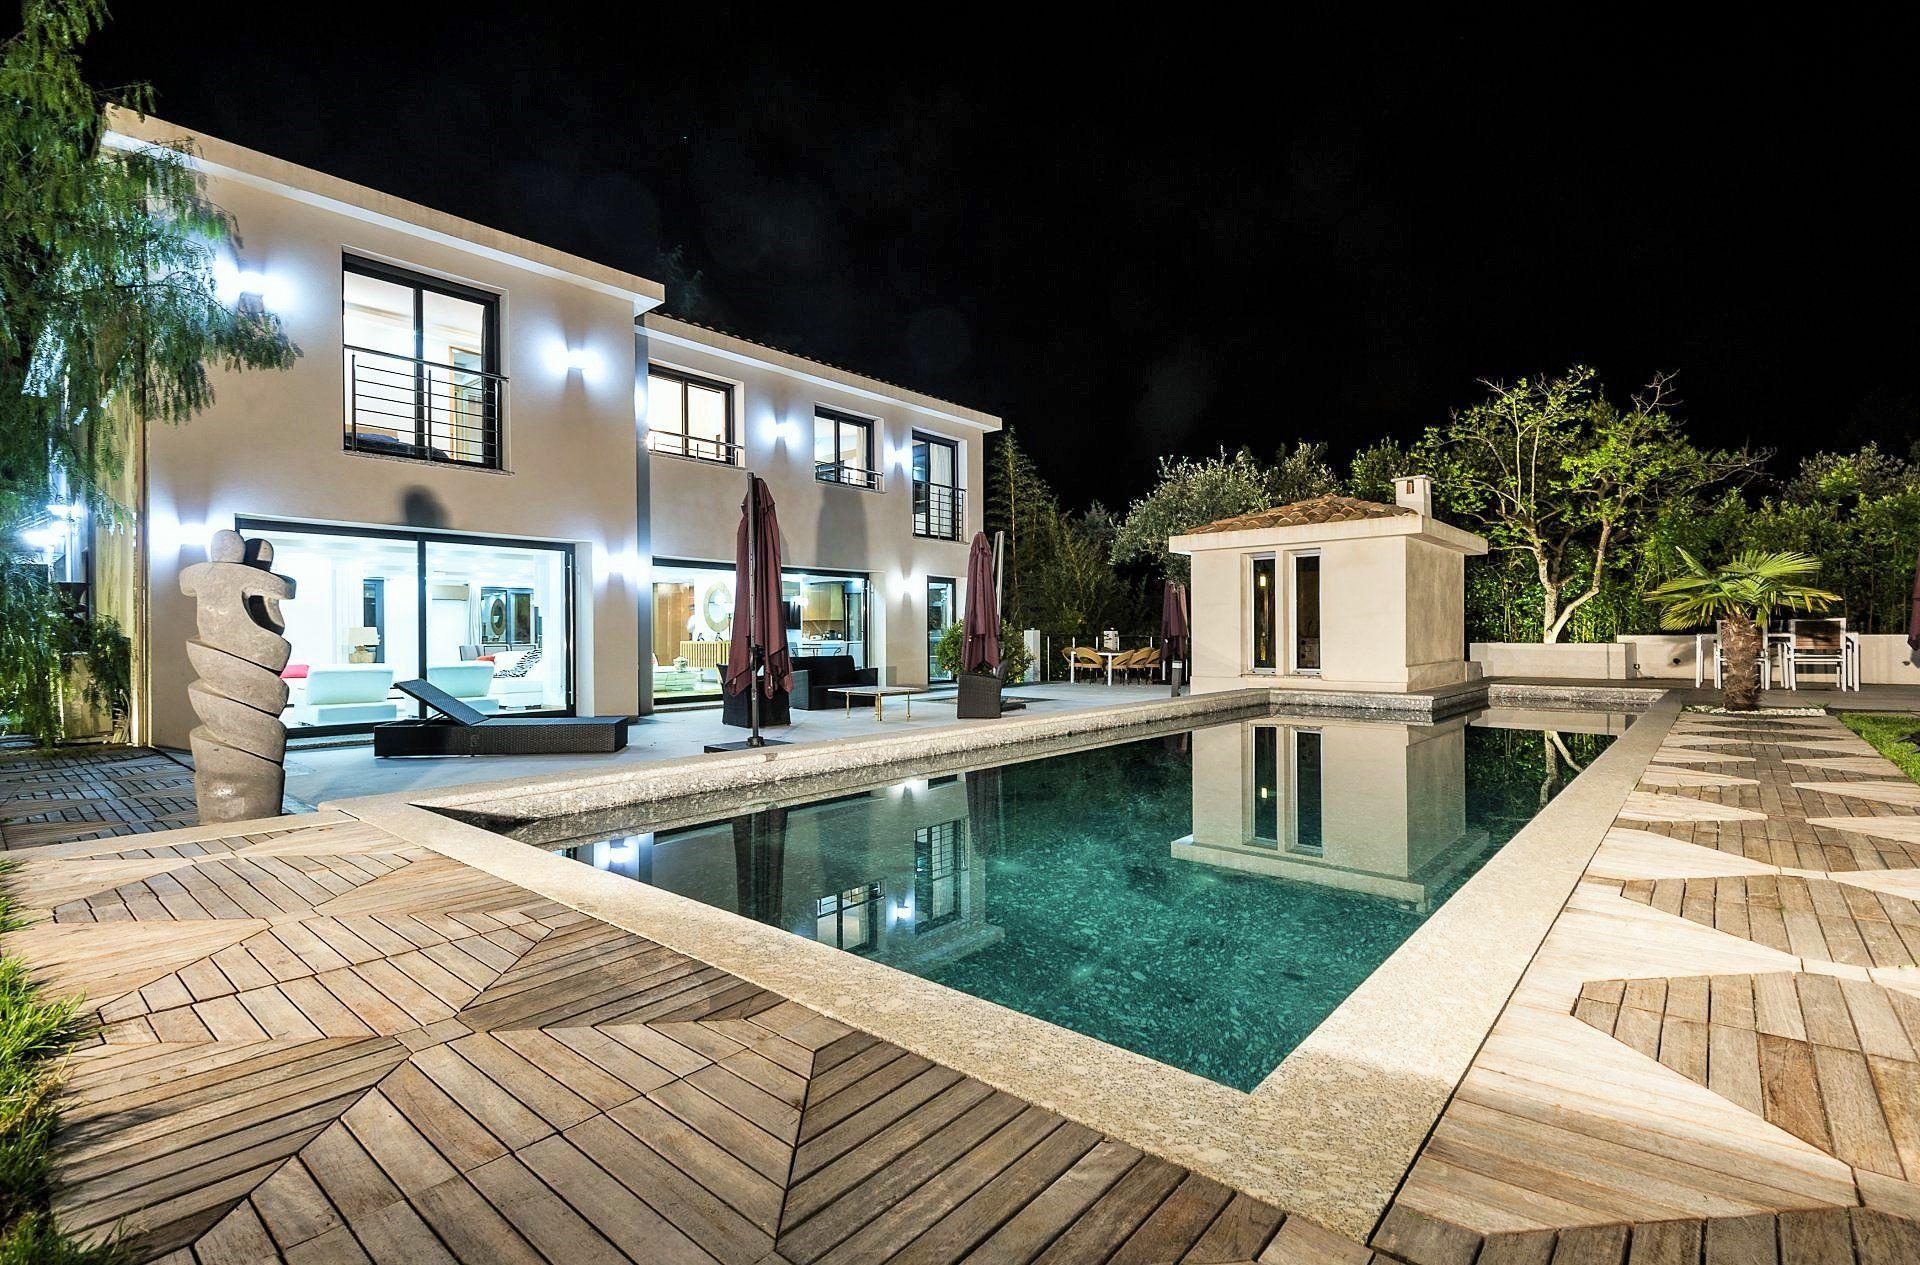 Villa Paraiso Is A Spectacular 20,000 Plus Square Foot Compound